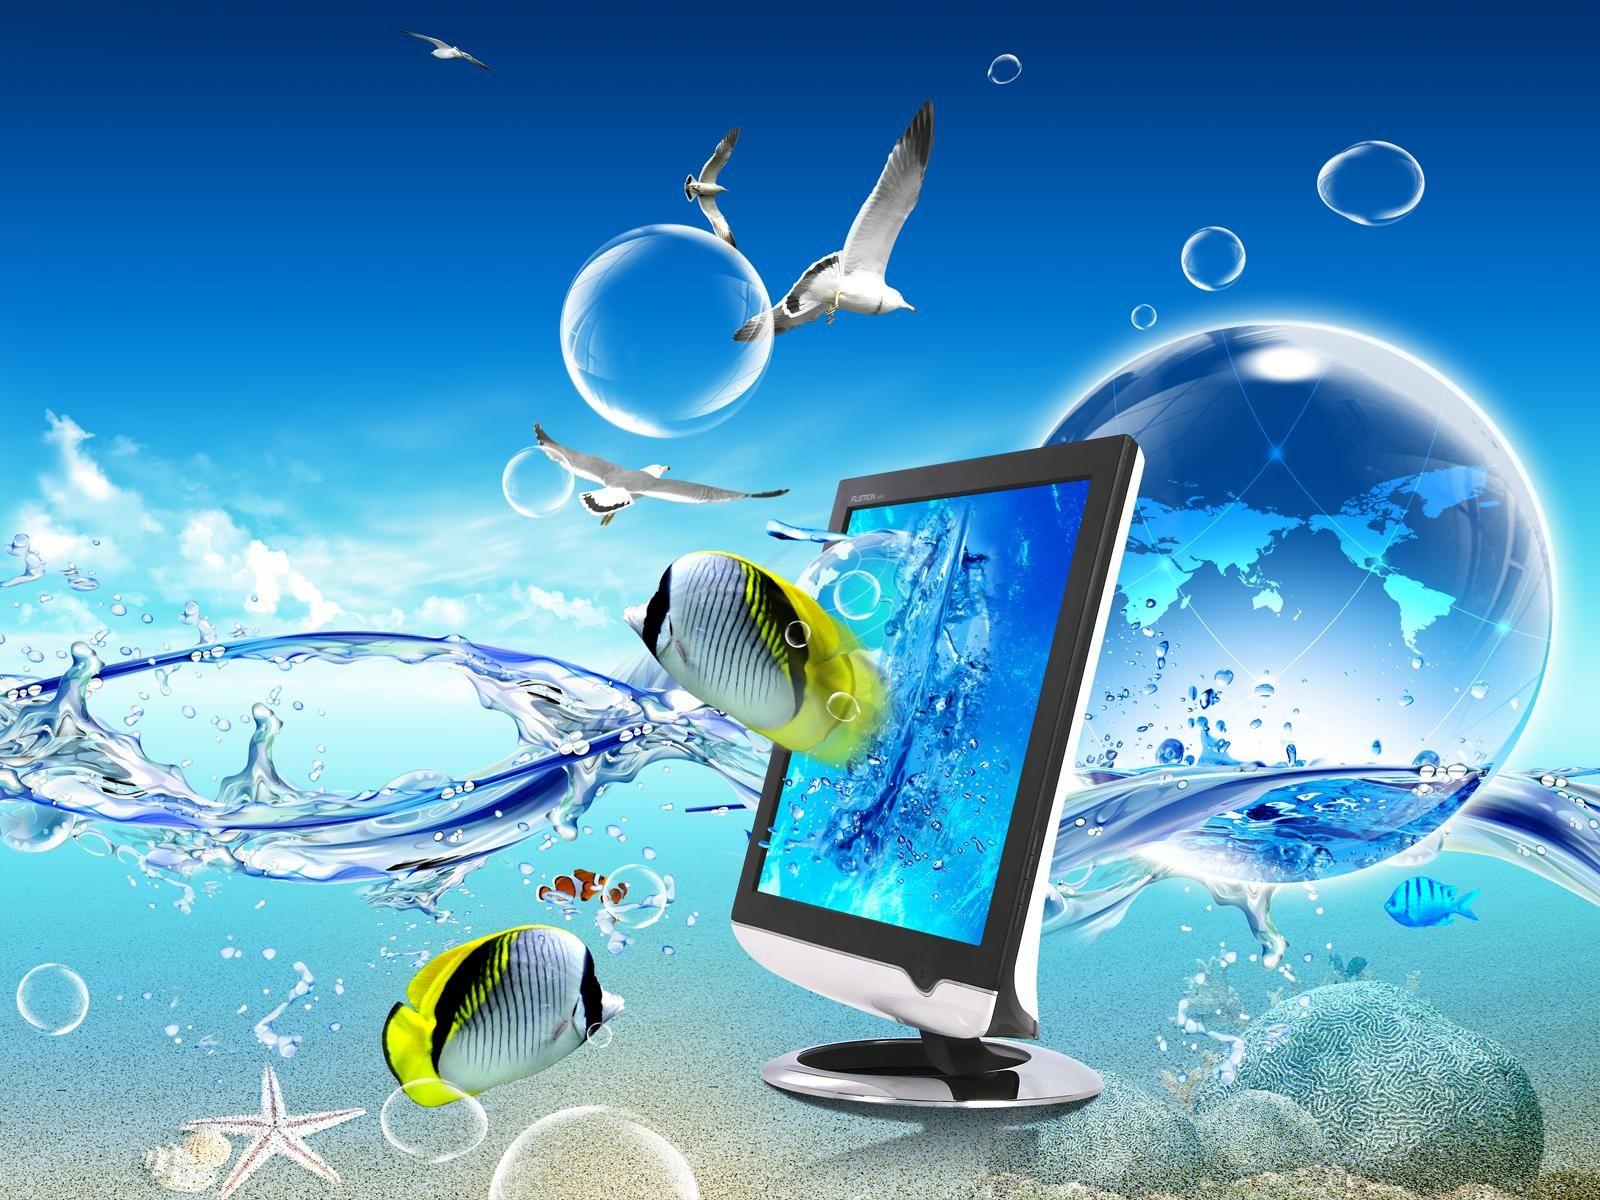 Download hd wallpaper for pc desktop